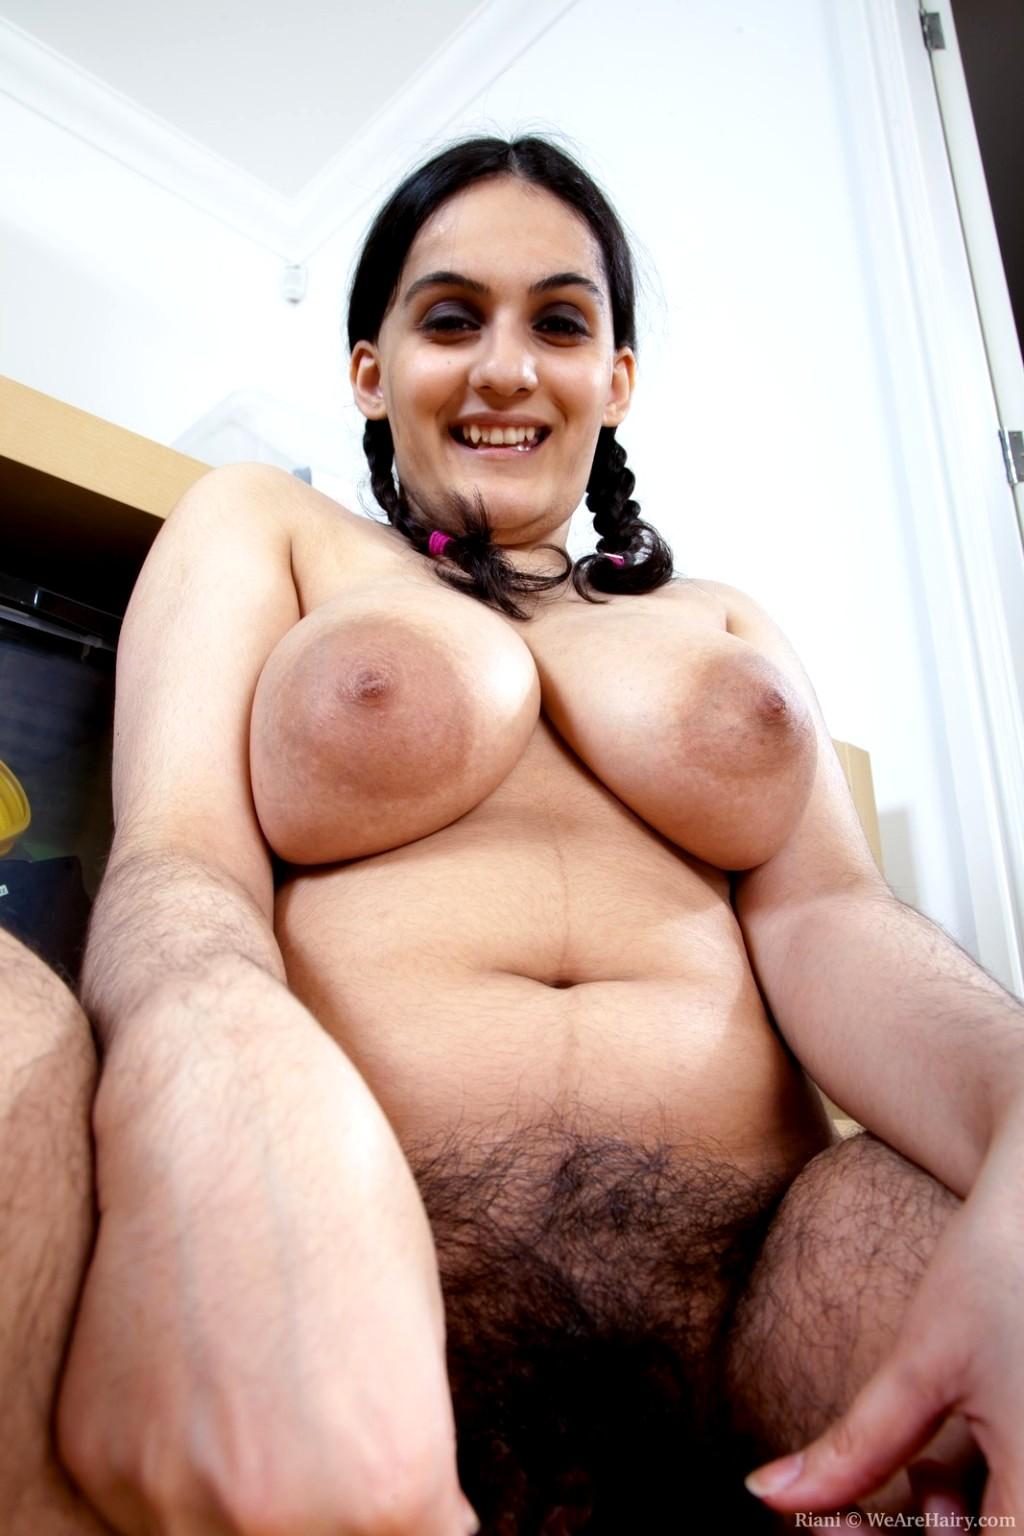 Rough dry anal porn